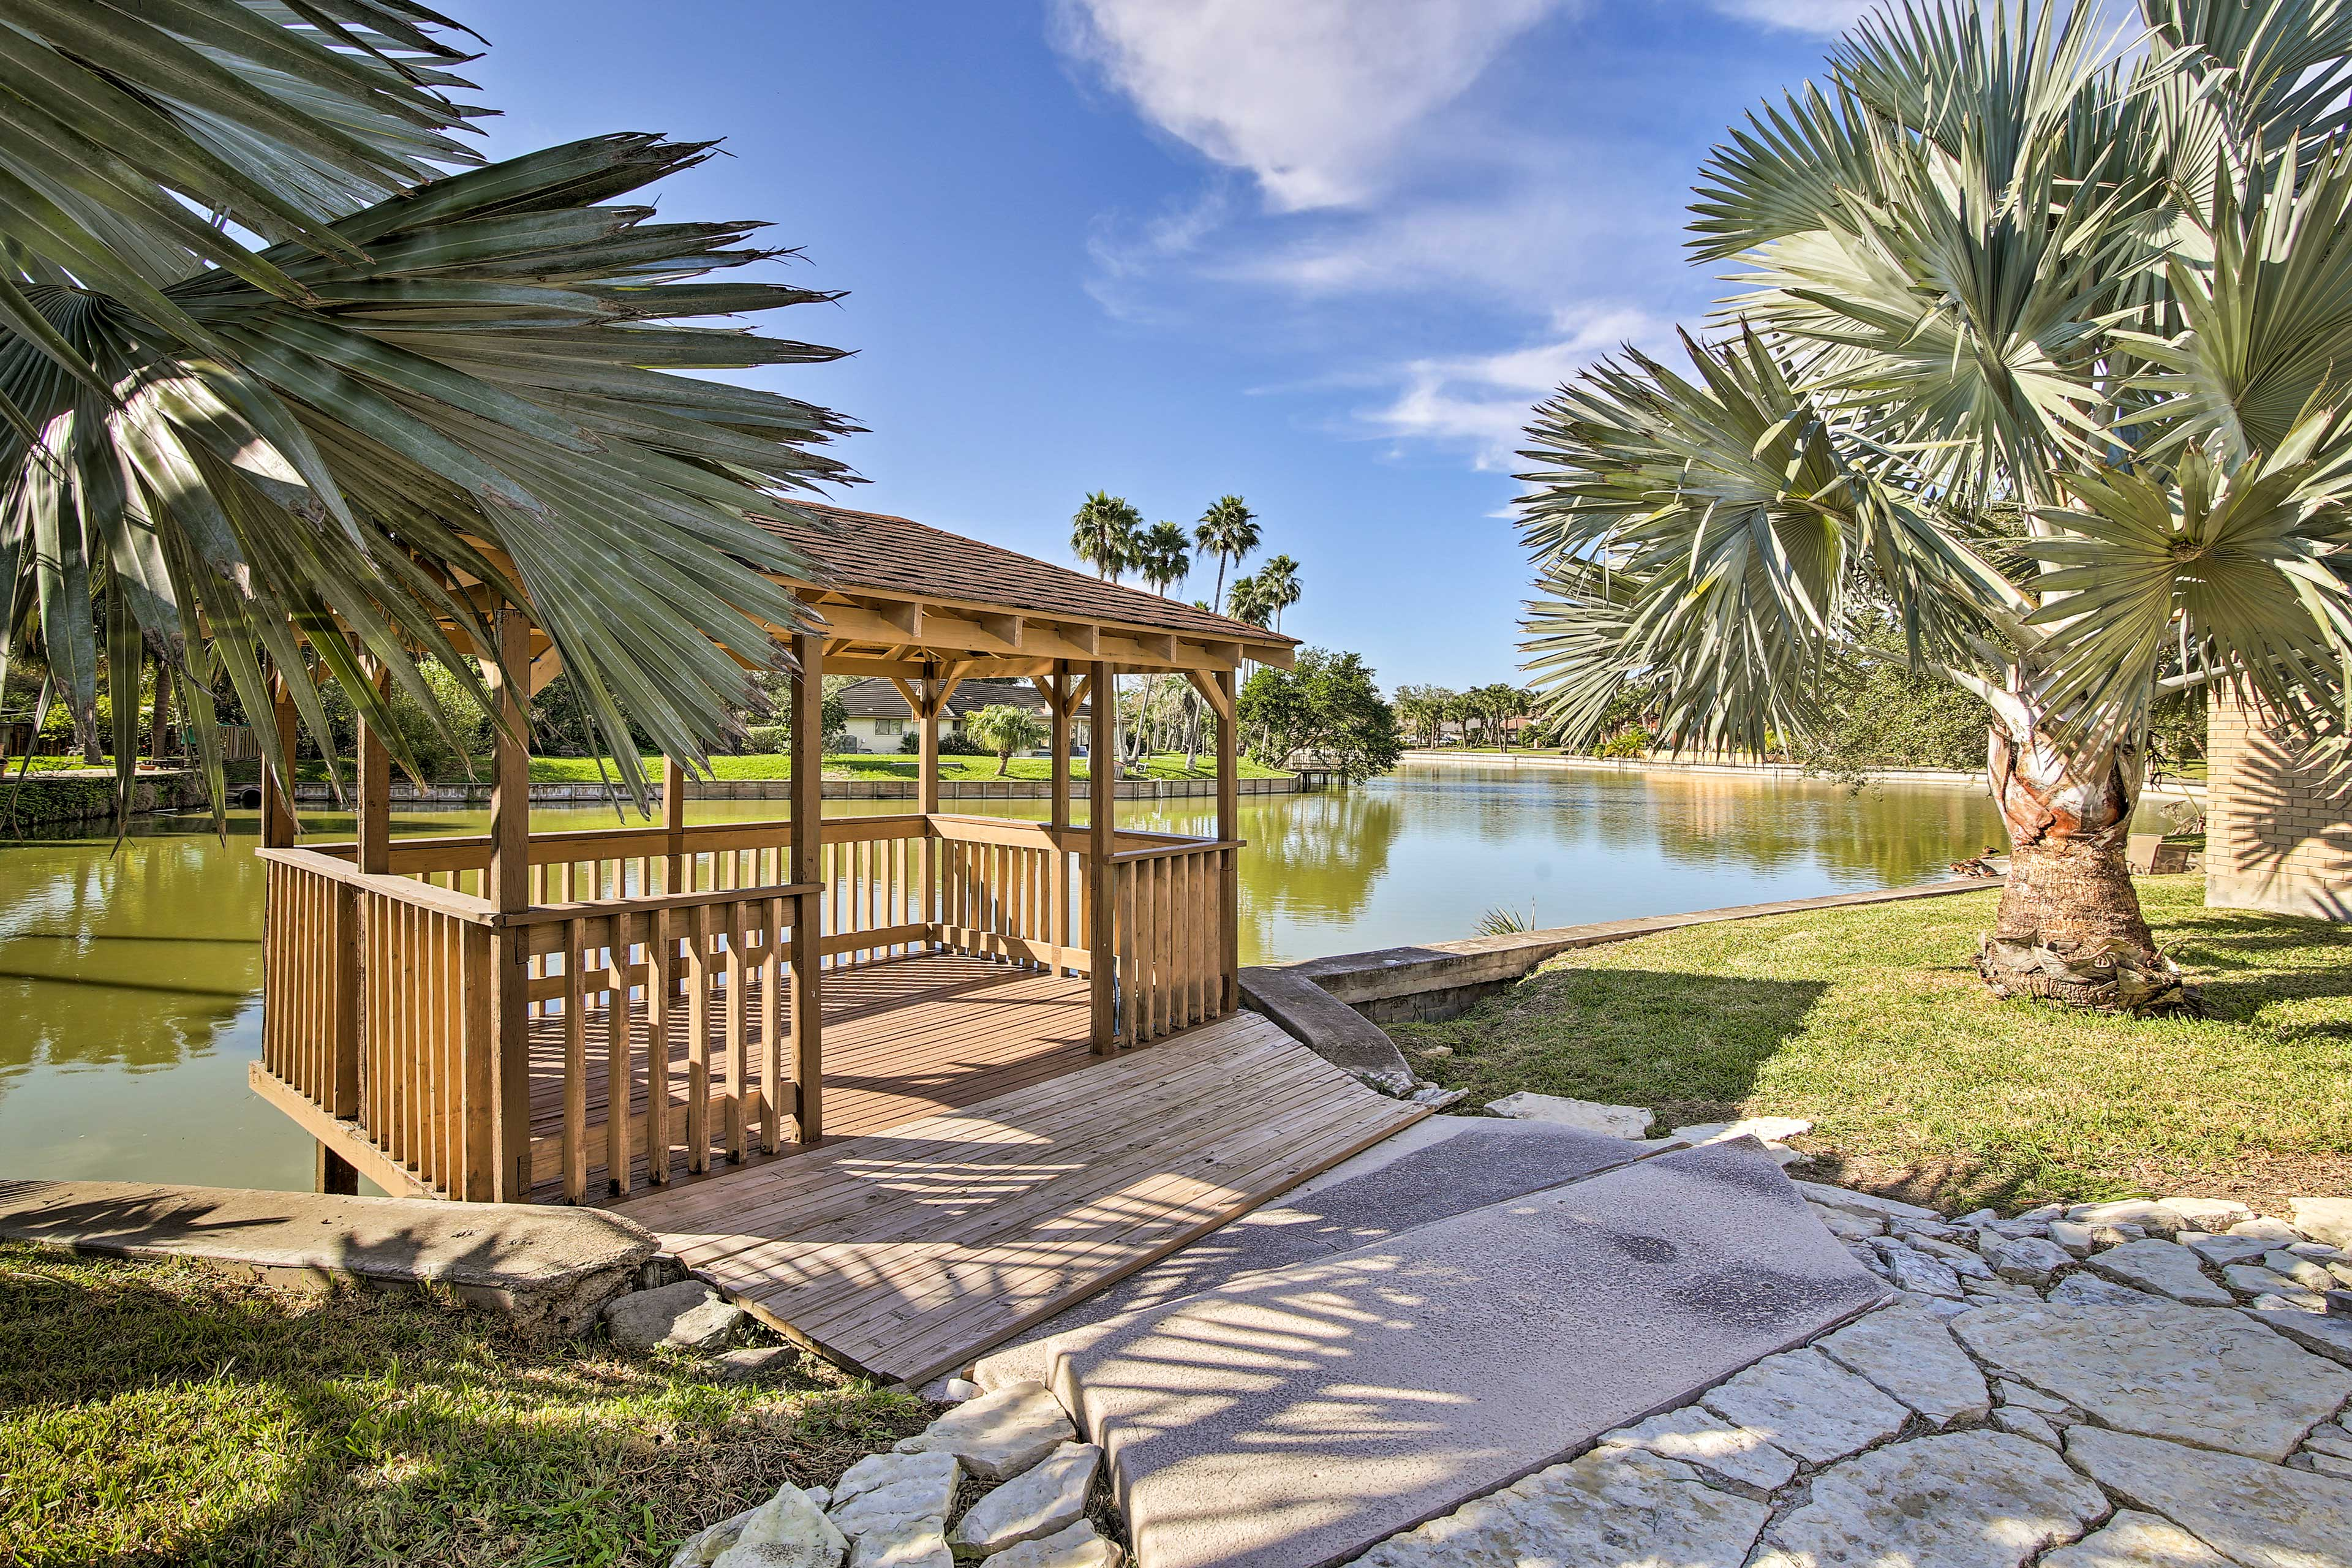 Enjoy the Texas sunshine from your waterfront gazebo!